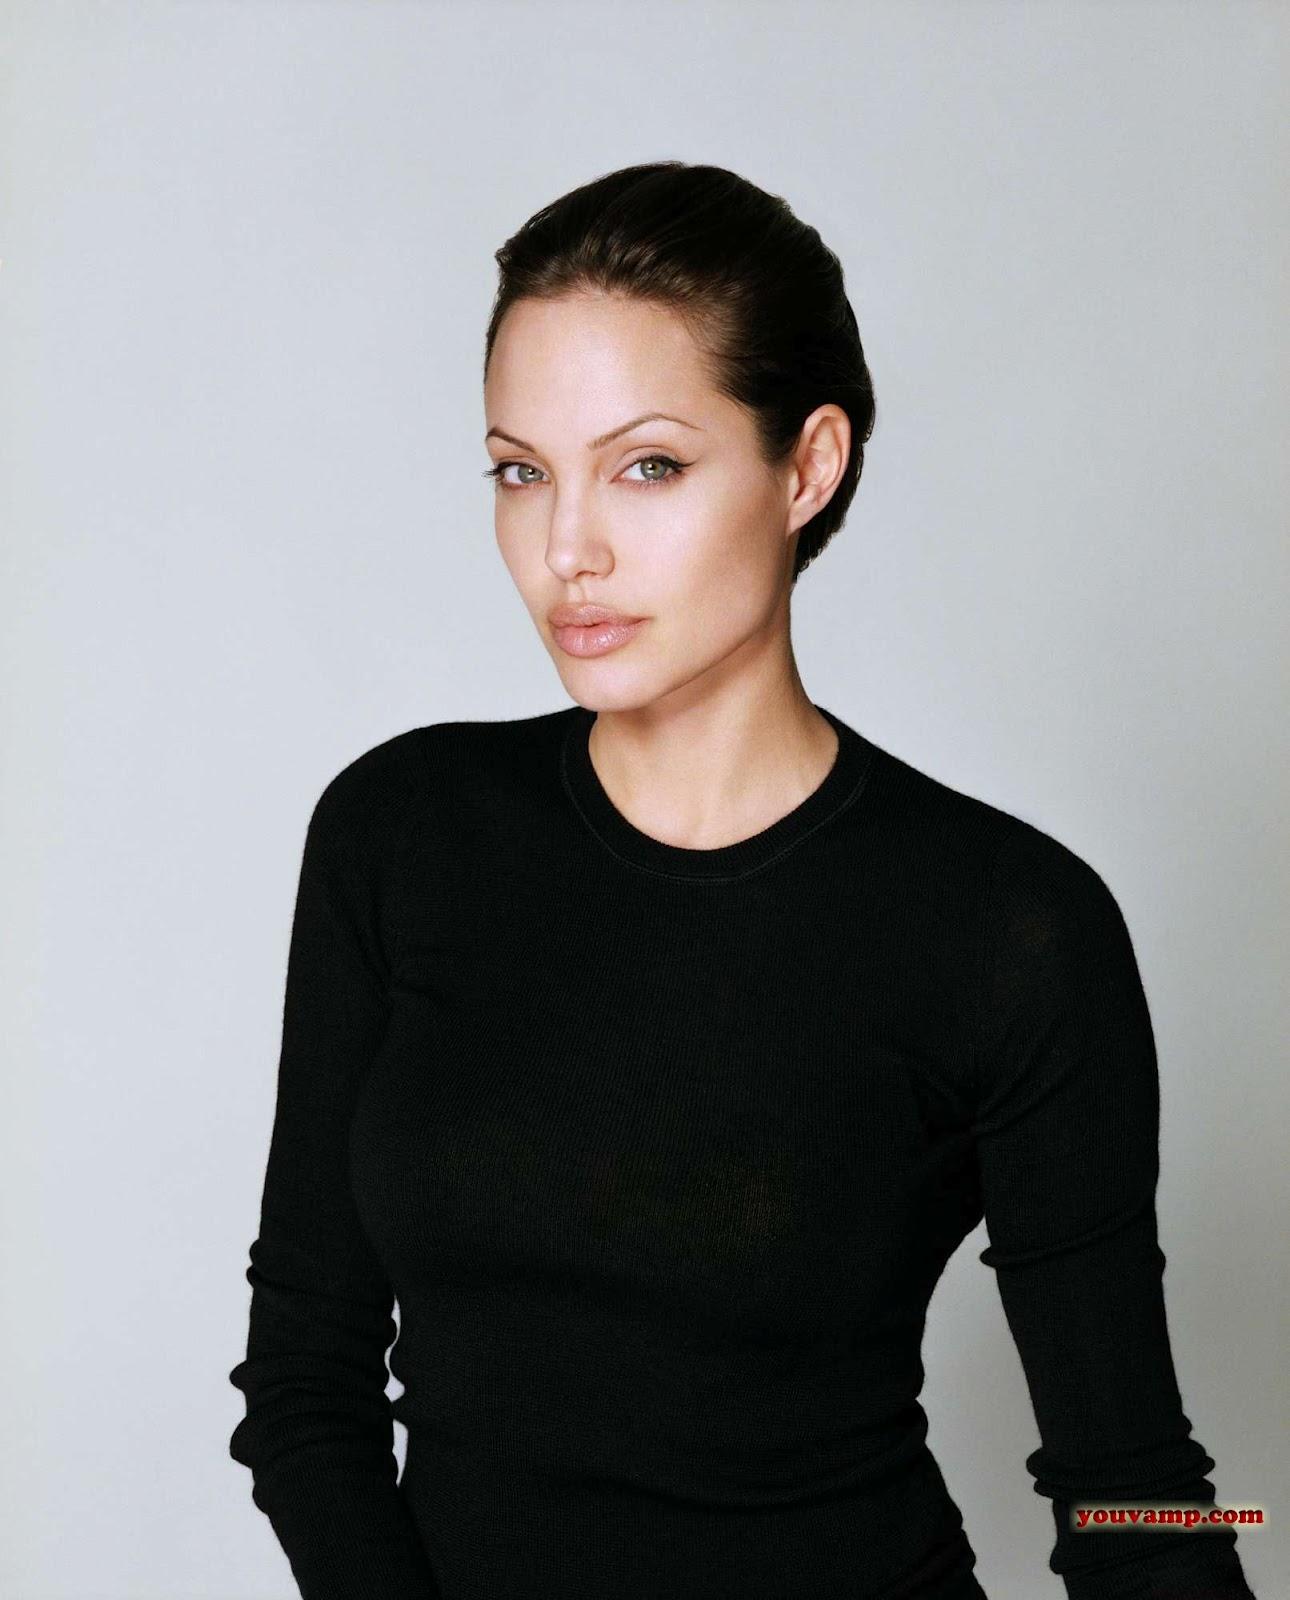 http://3.bp.blogspot.com/-NJkFD5Yahbc/T14xfKoF1JI/AAAAAAAABdo/XxT58Nl_3QI/s1600/Angelina+Jolie+YouVamp+32.jpg